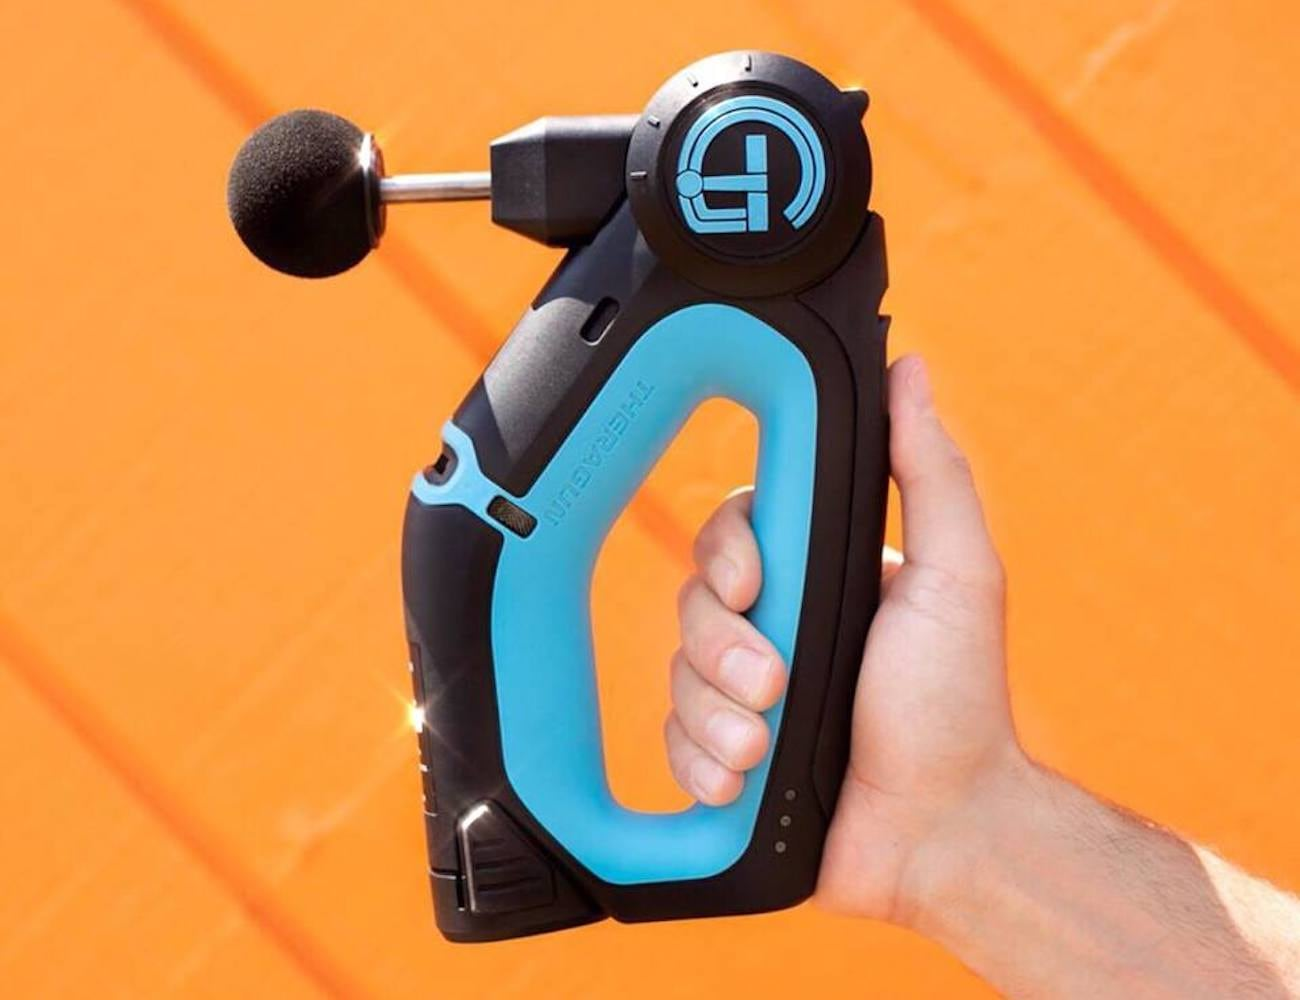 Theragun G2PRO Professional Handheld Massager